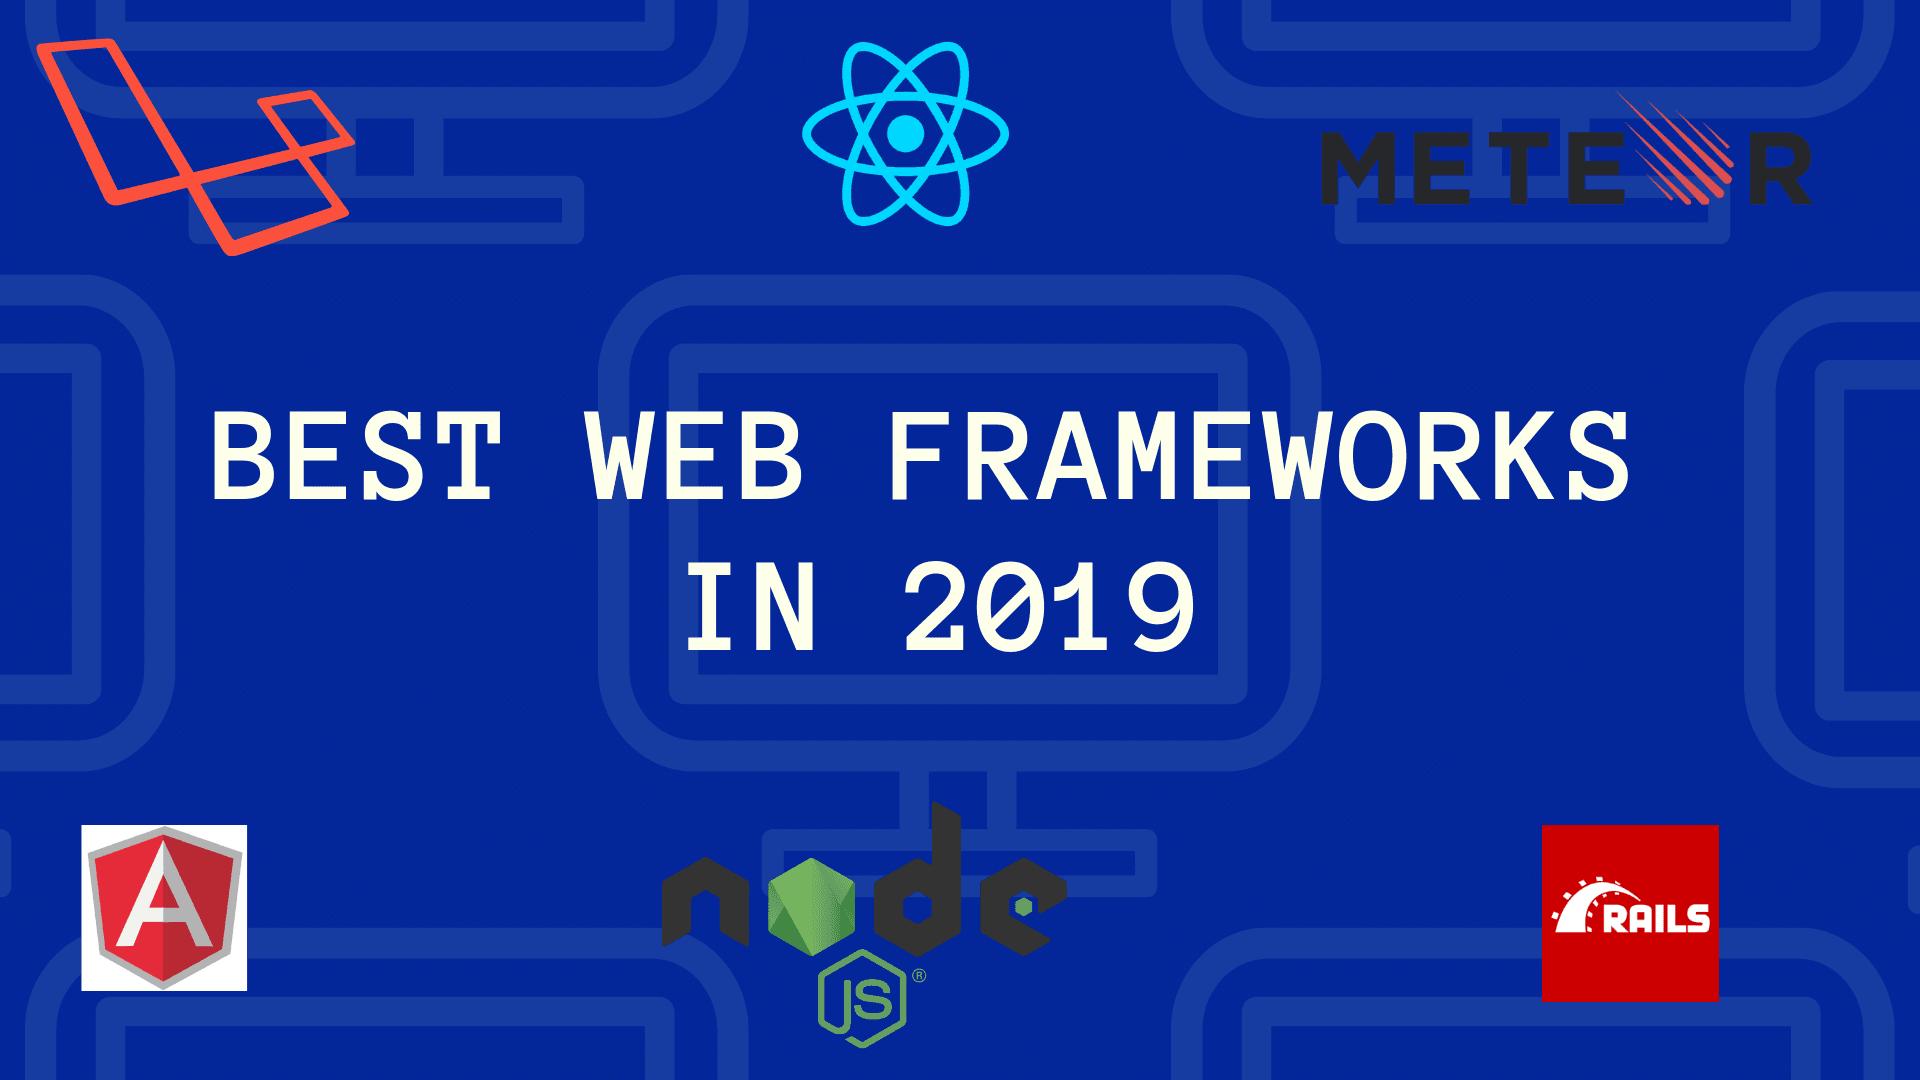 Best Web frameworks in 2019